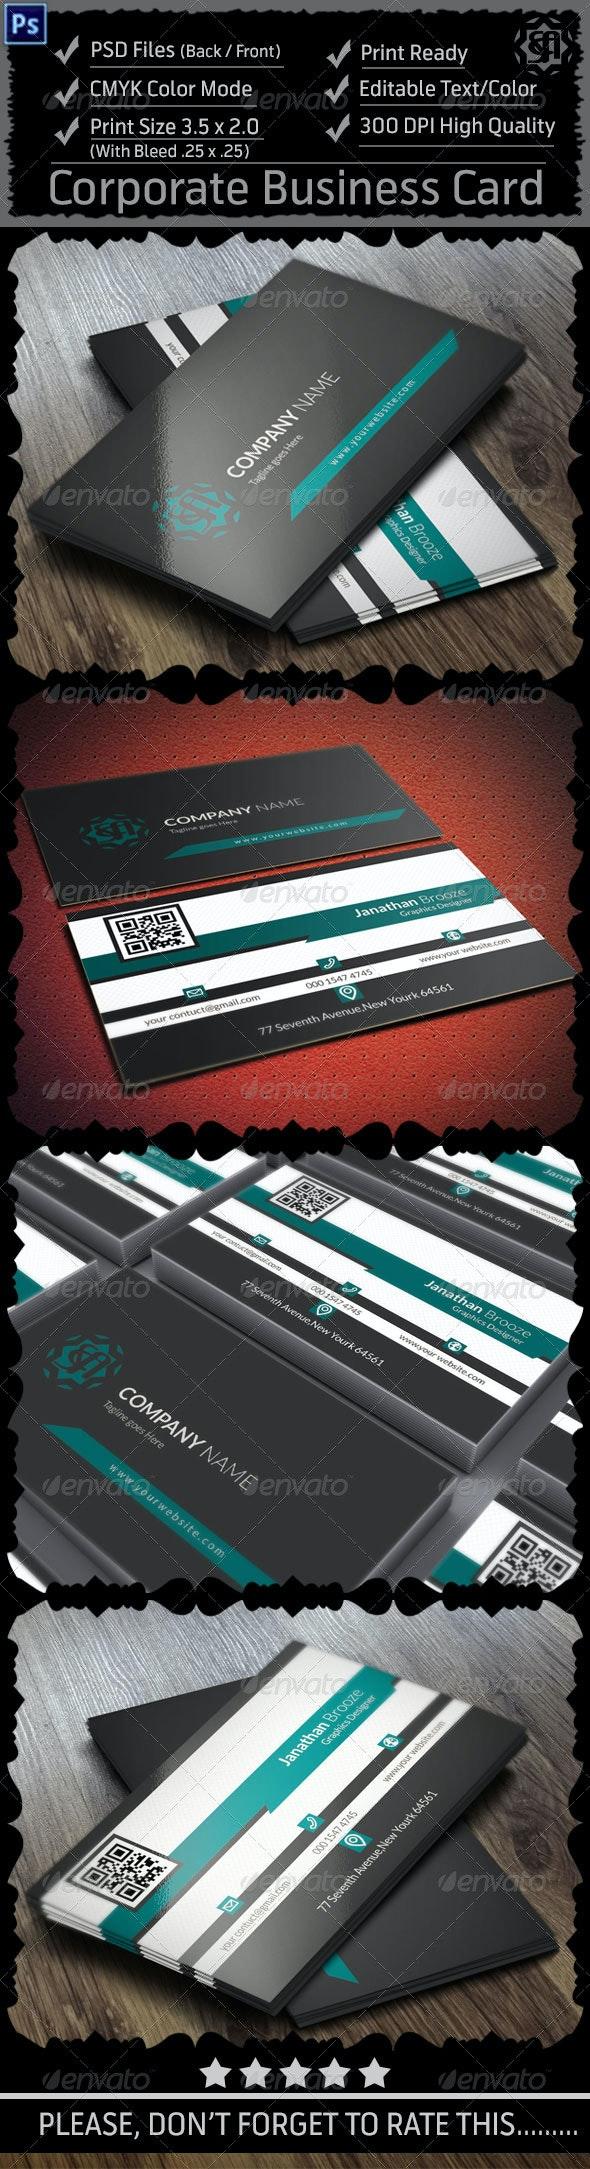 Corporate Business Card Vol: 10 - Corporate Business Cards